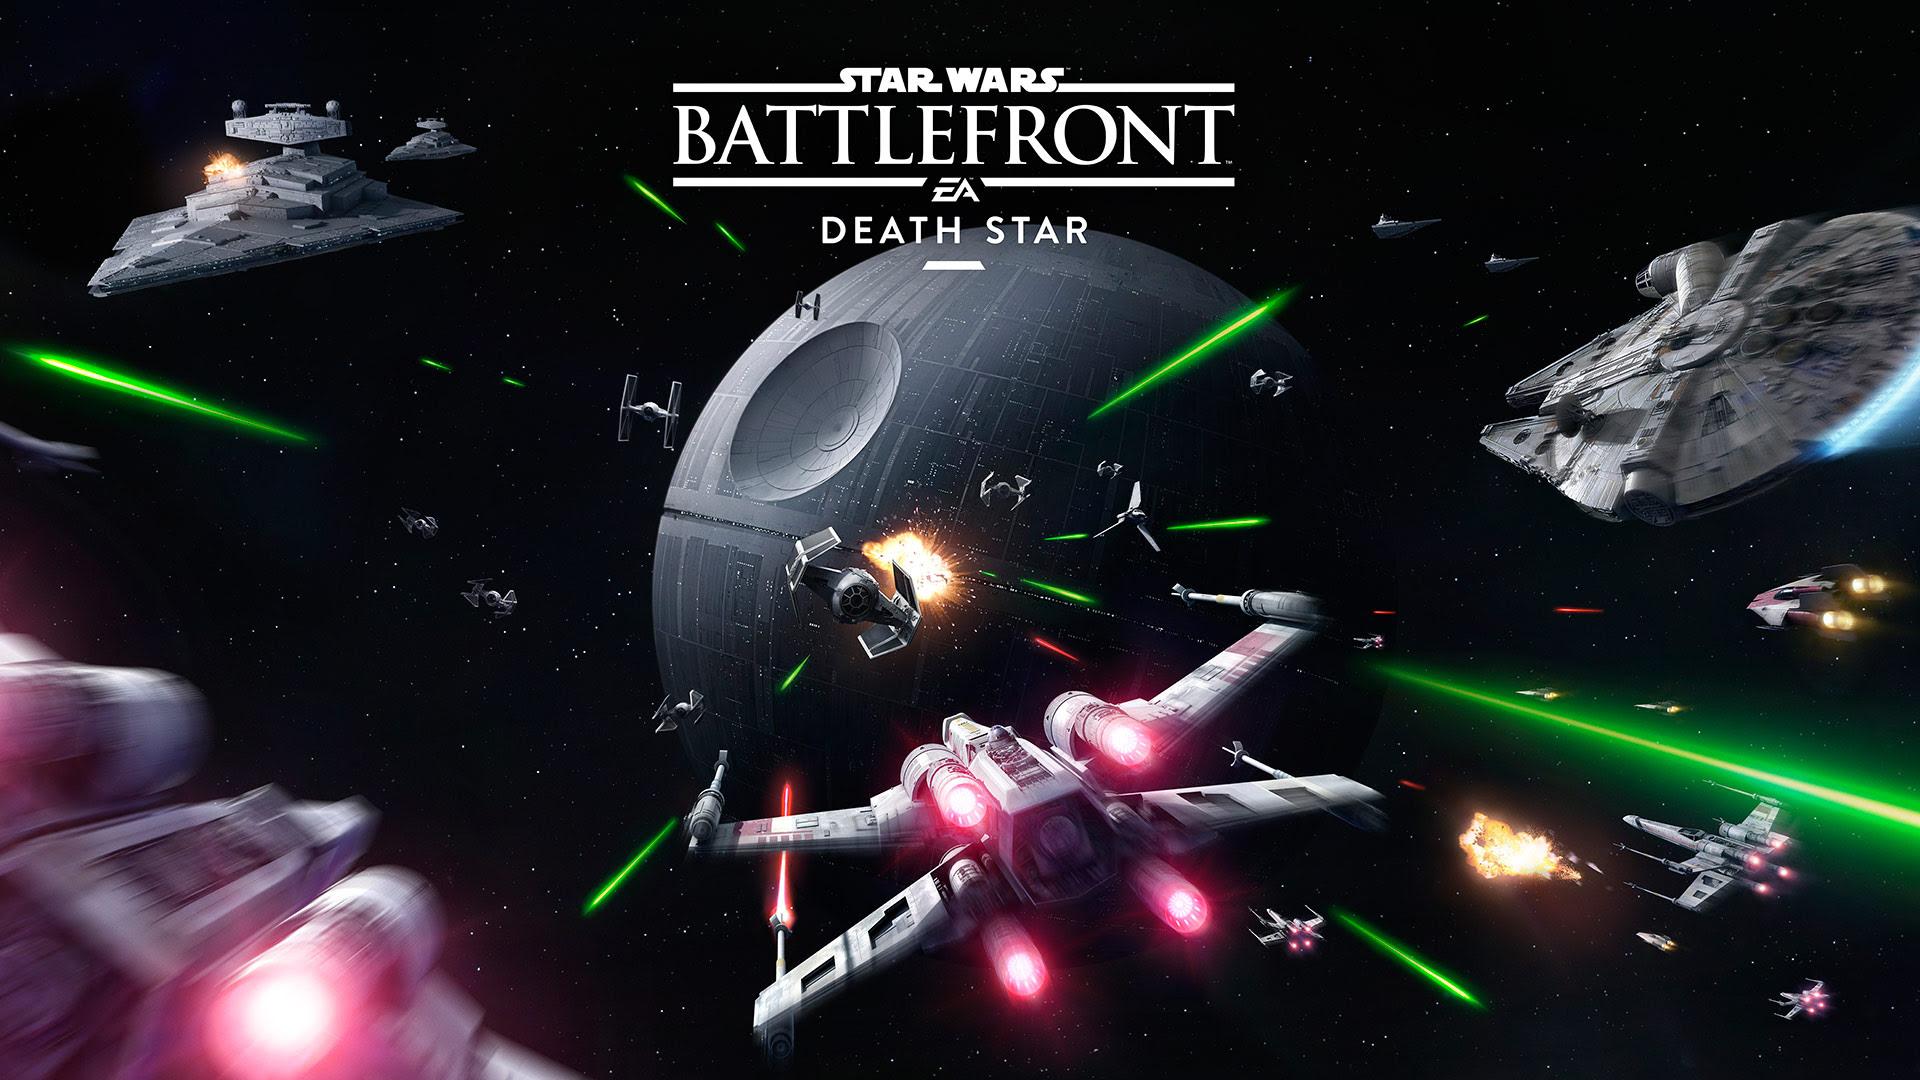 Star Wars Battlefront Death Star Expansion Details Announced